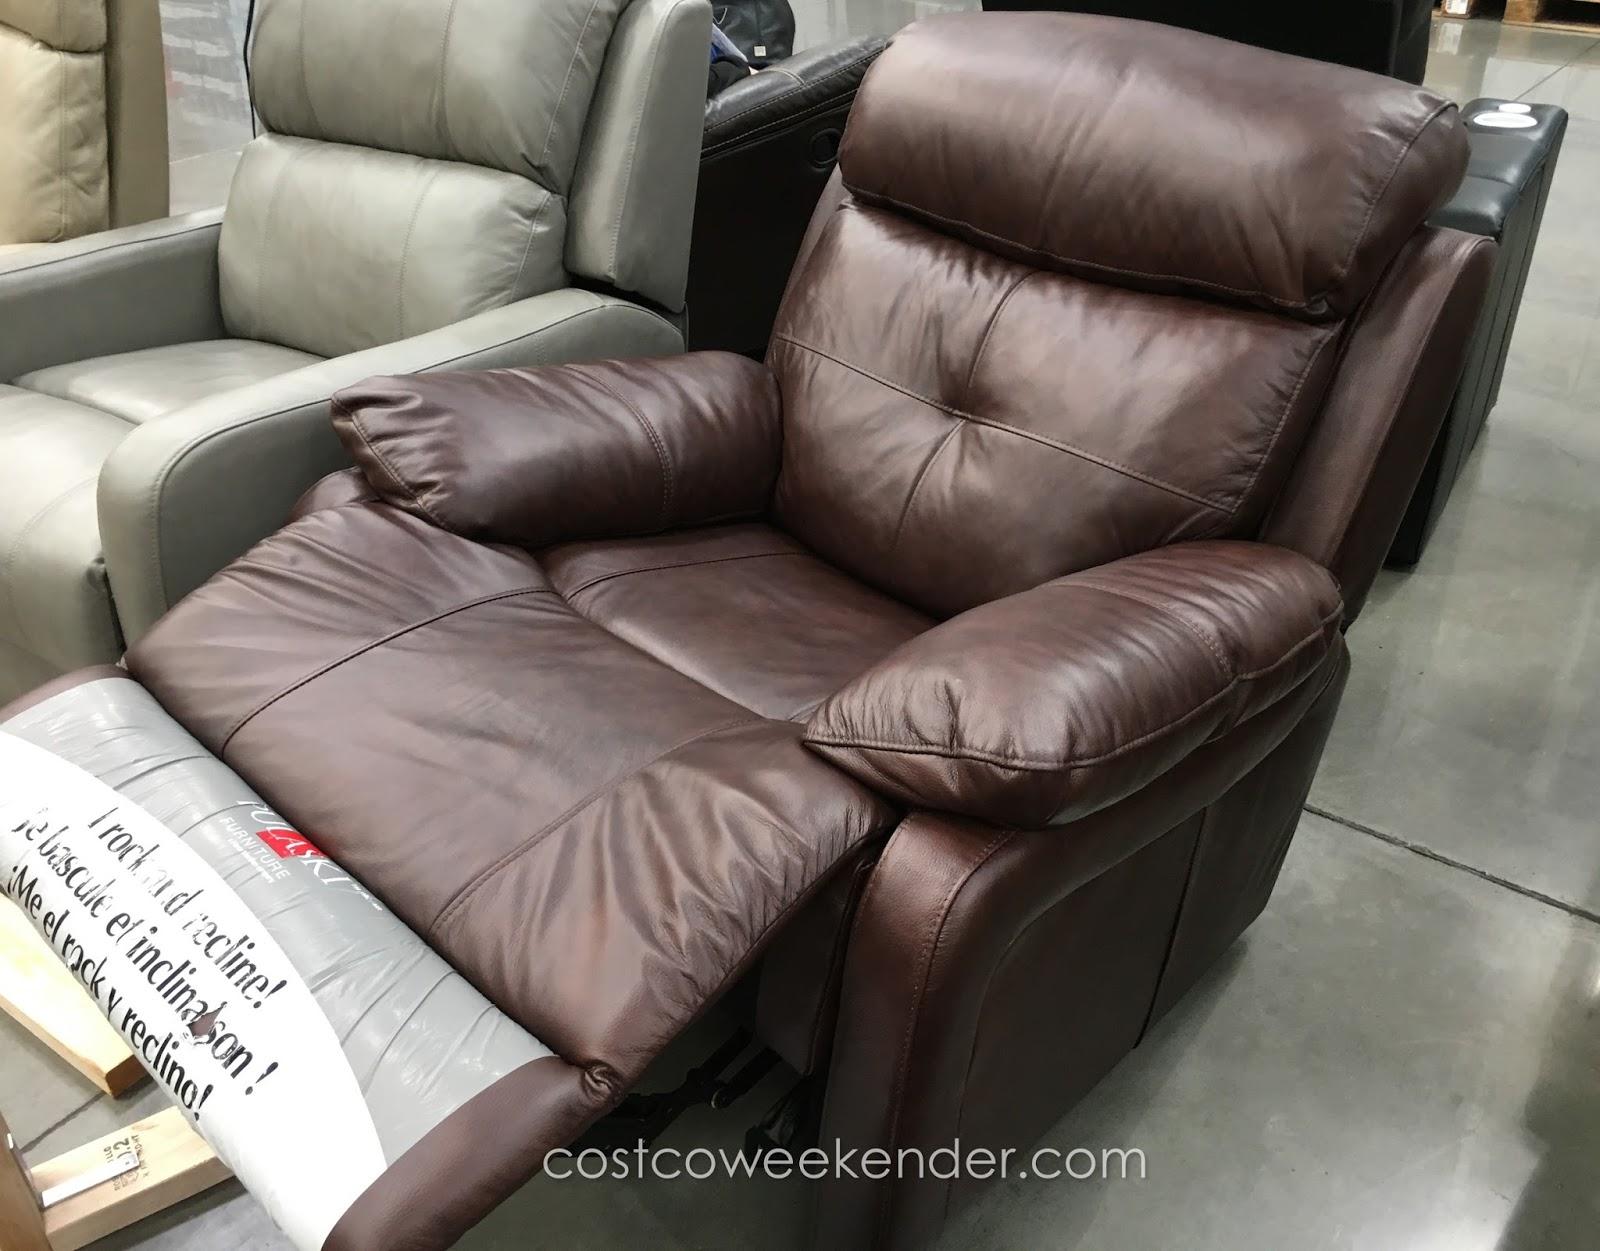 Pulaski Leather Rocker Recliner Chair Costco Weekender